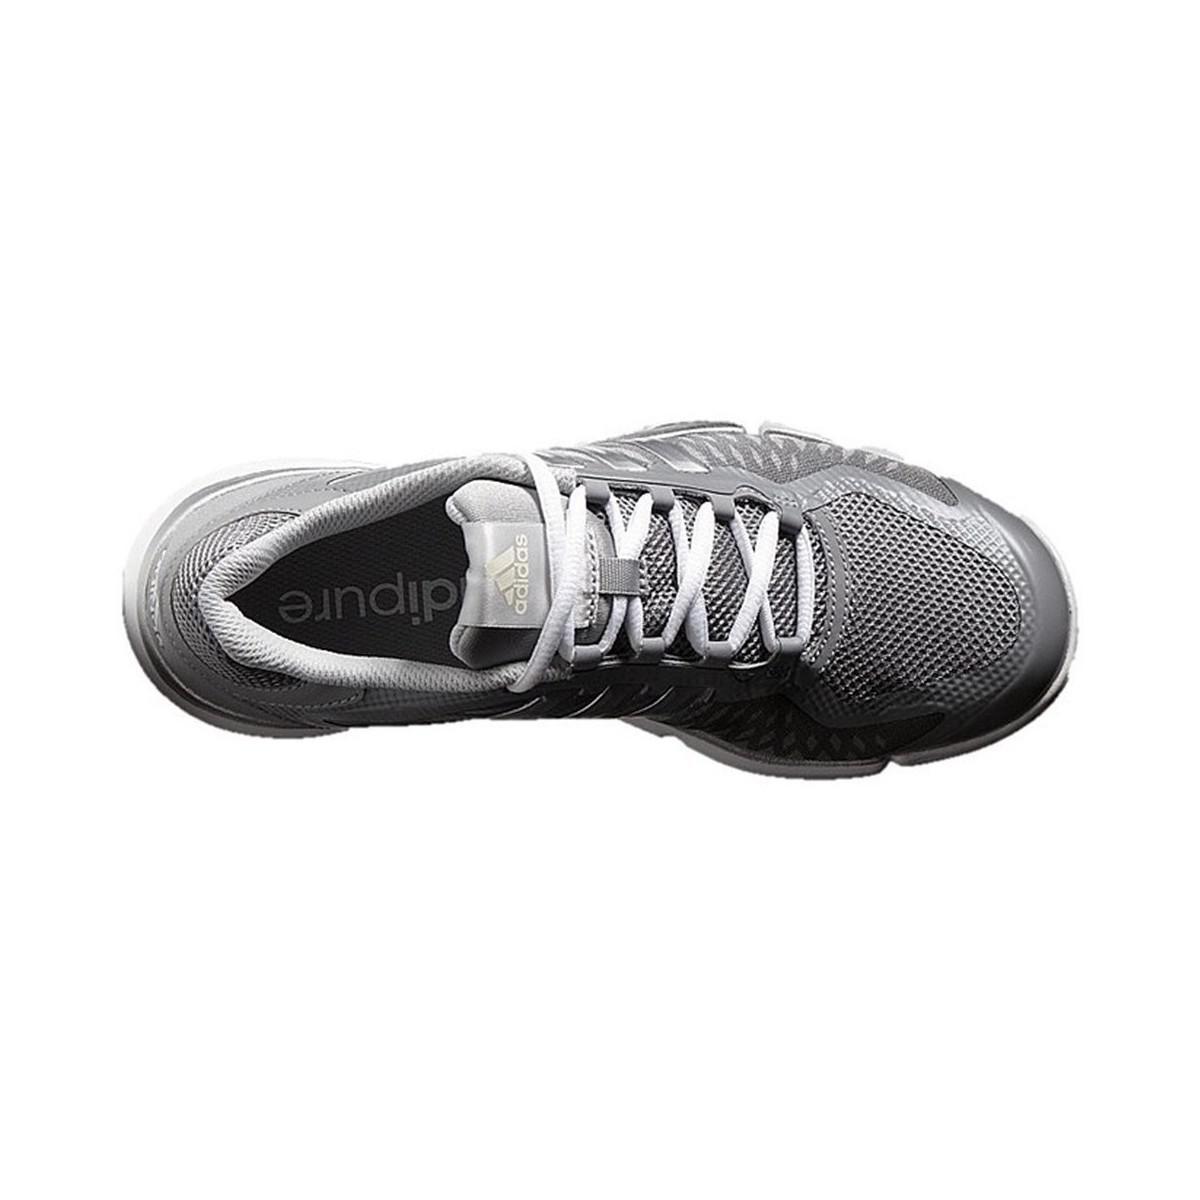 premium selection fef2e 04f5c Adidas - Metallic Adipure 360 Control Womens Running Trainers In Silver -  Lyst. View fullscreen